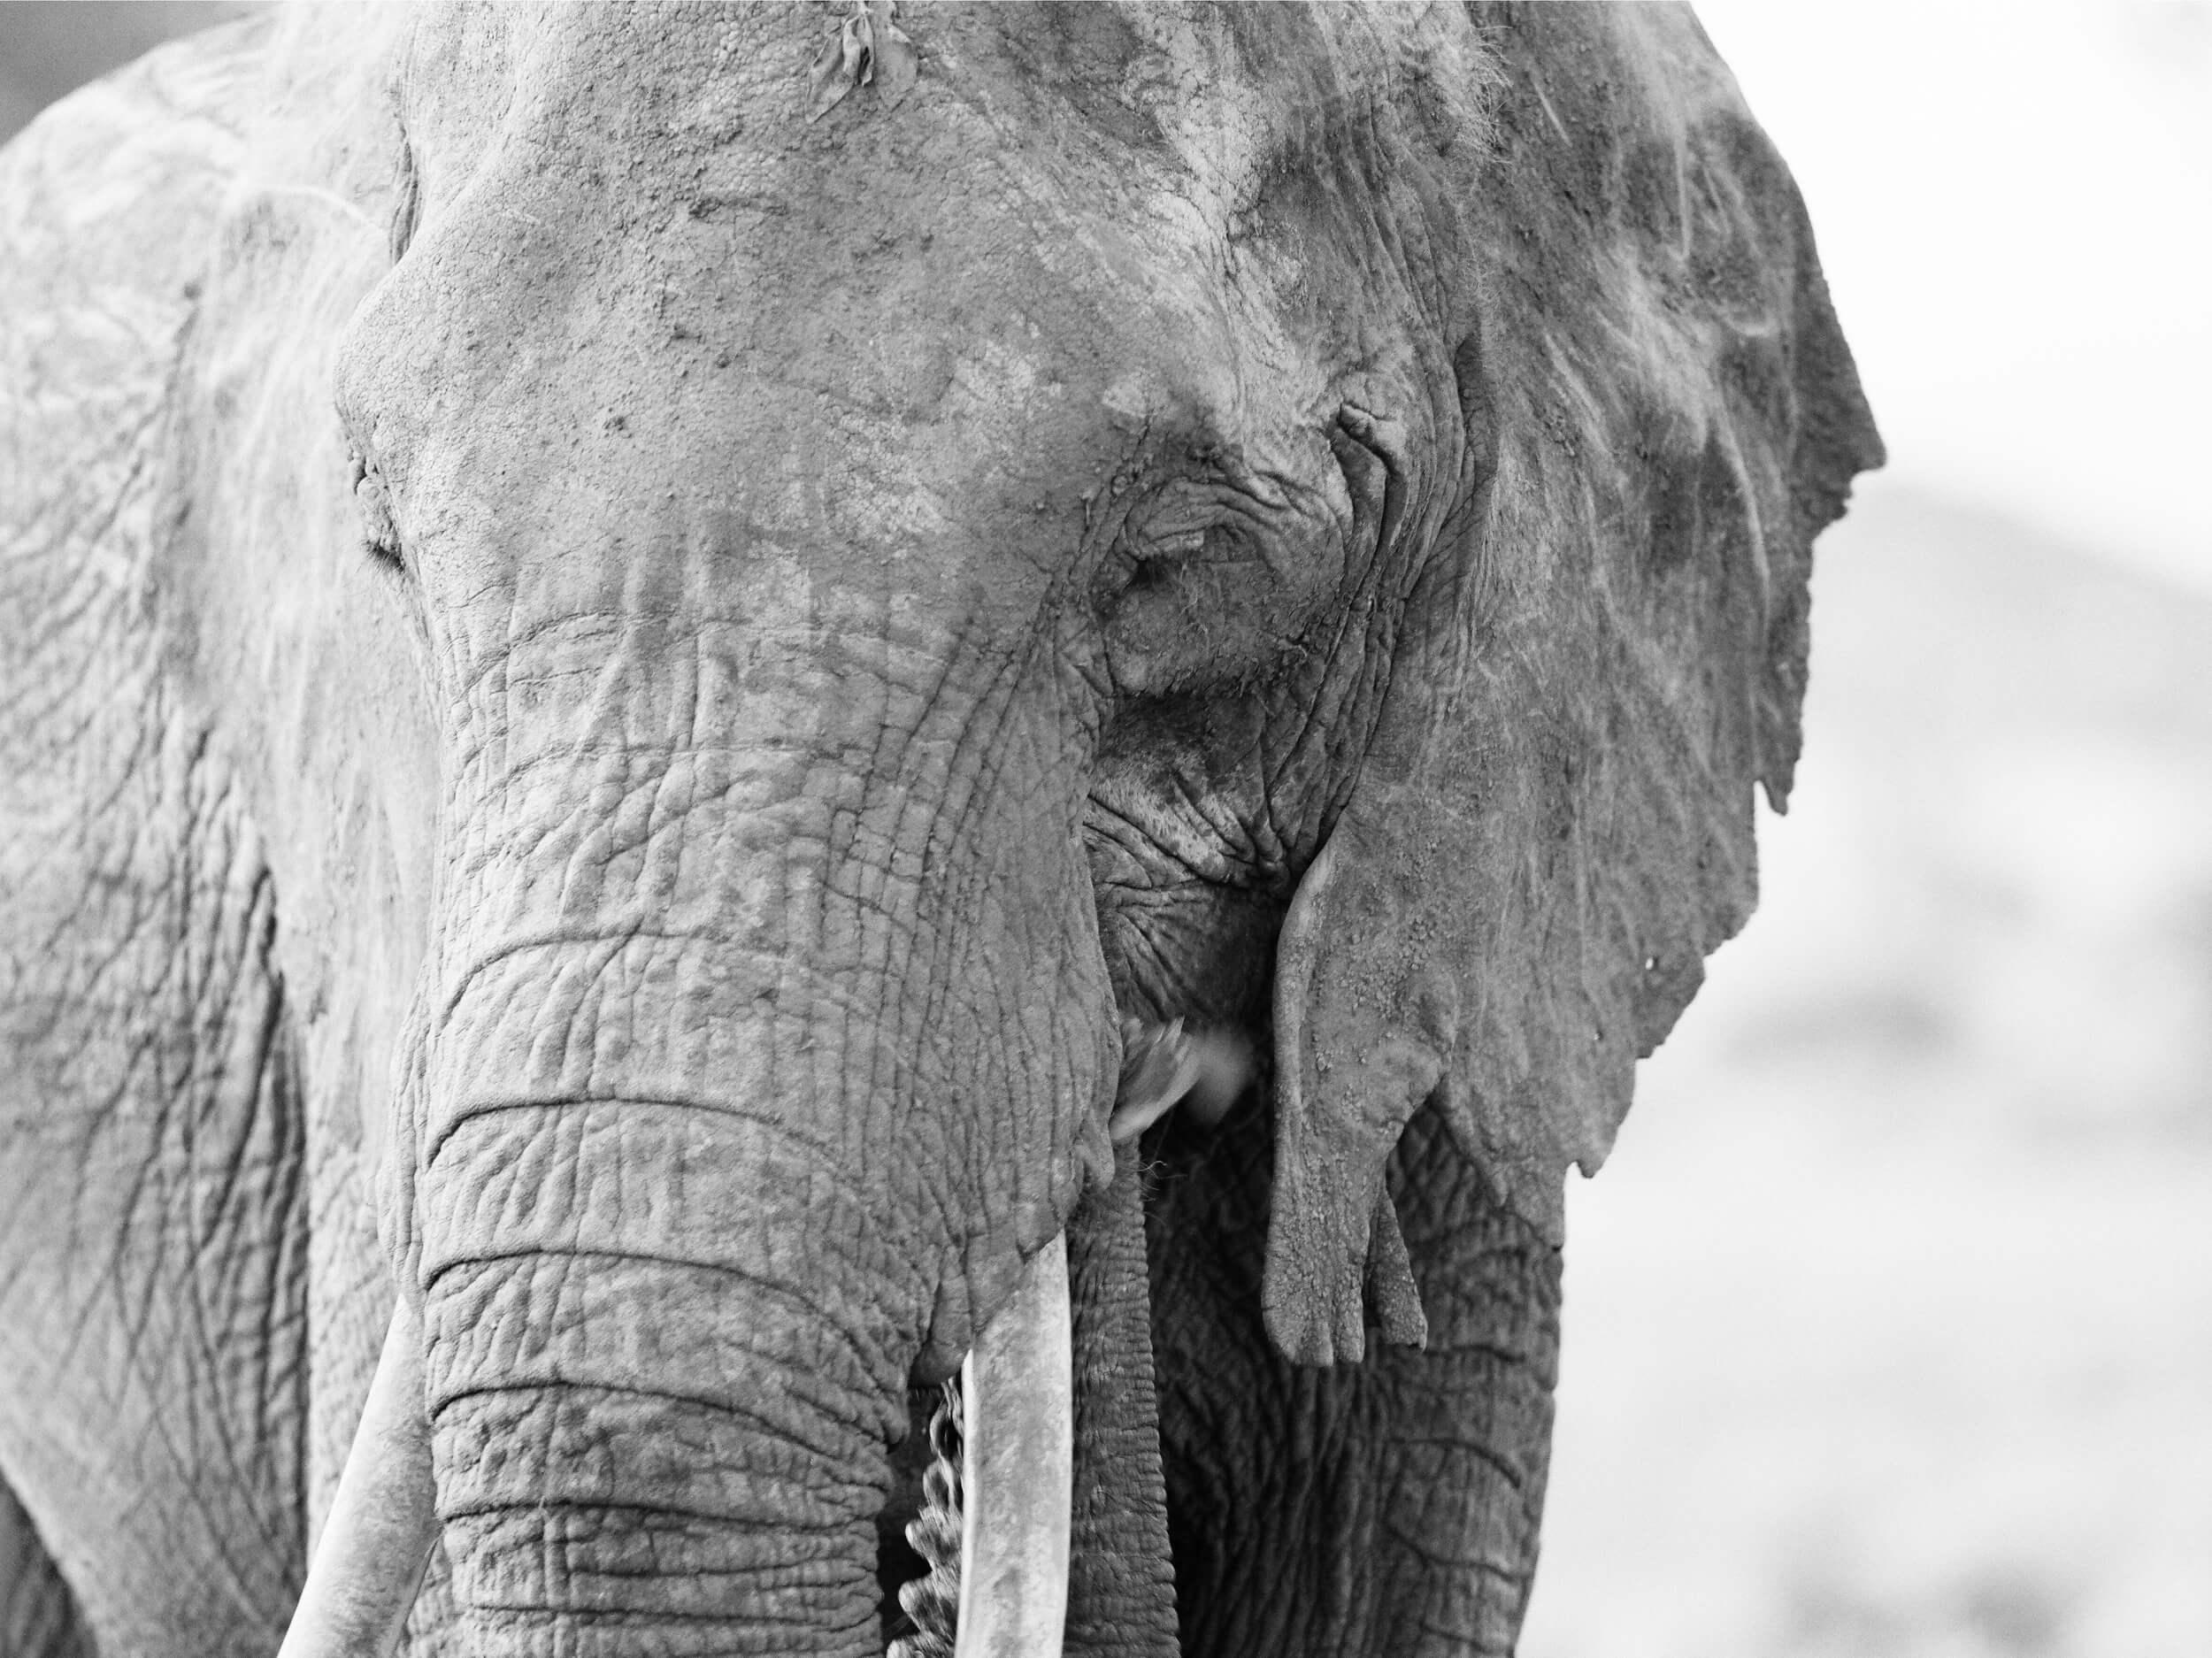 elephant the new big 5 of wildlife photography